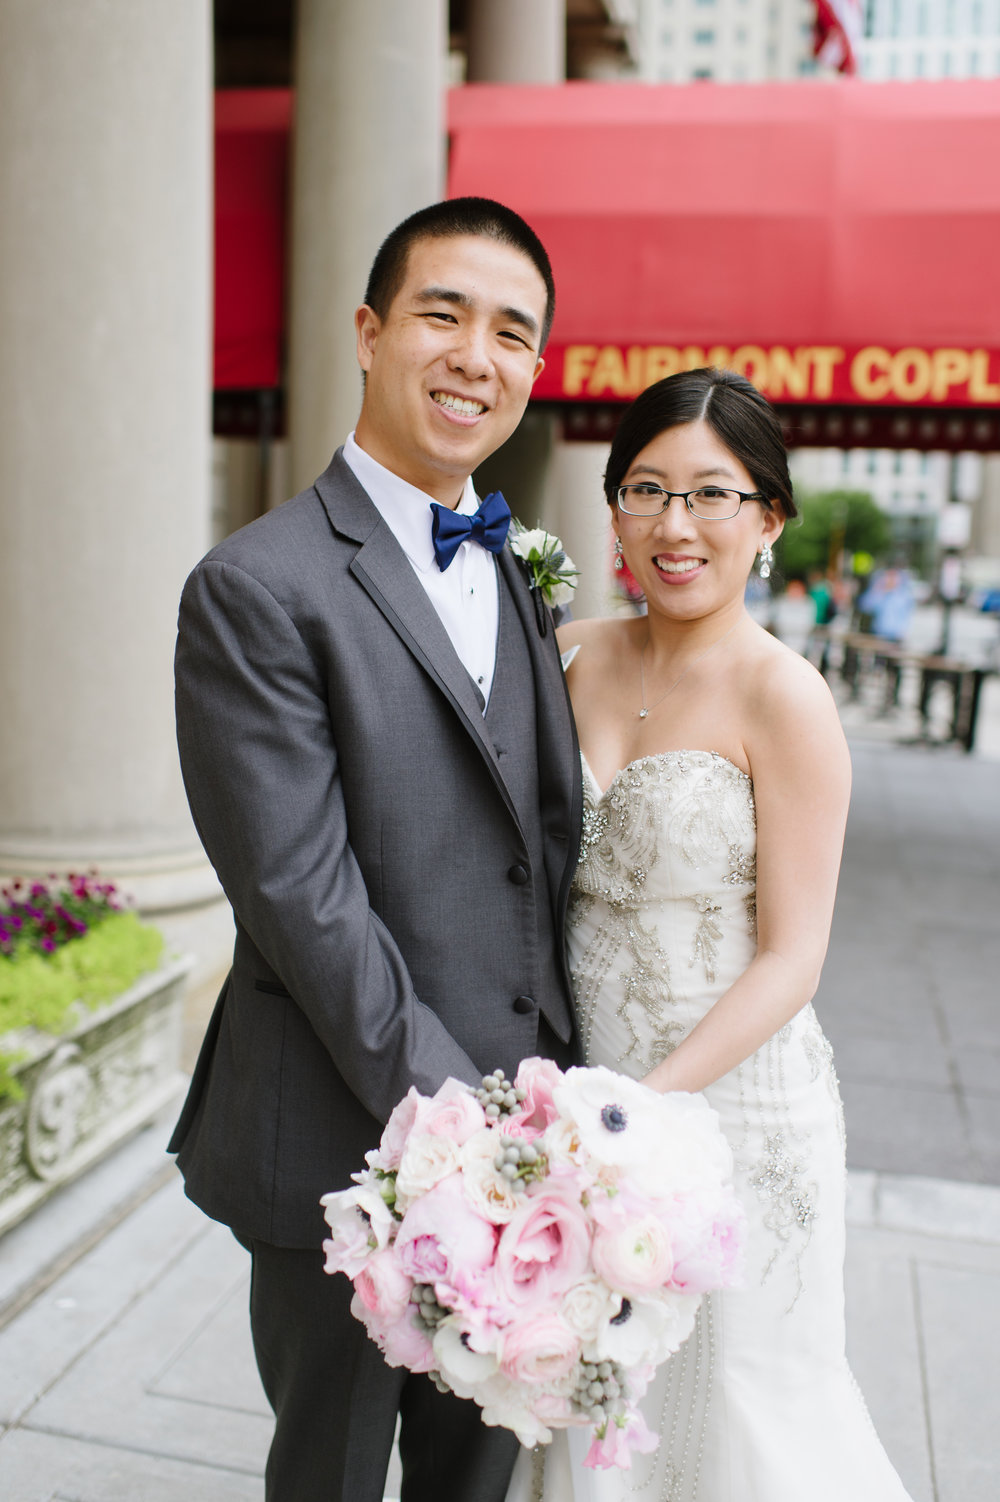 Fairmont-Copley-Wedding-Boston001.jpg